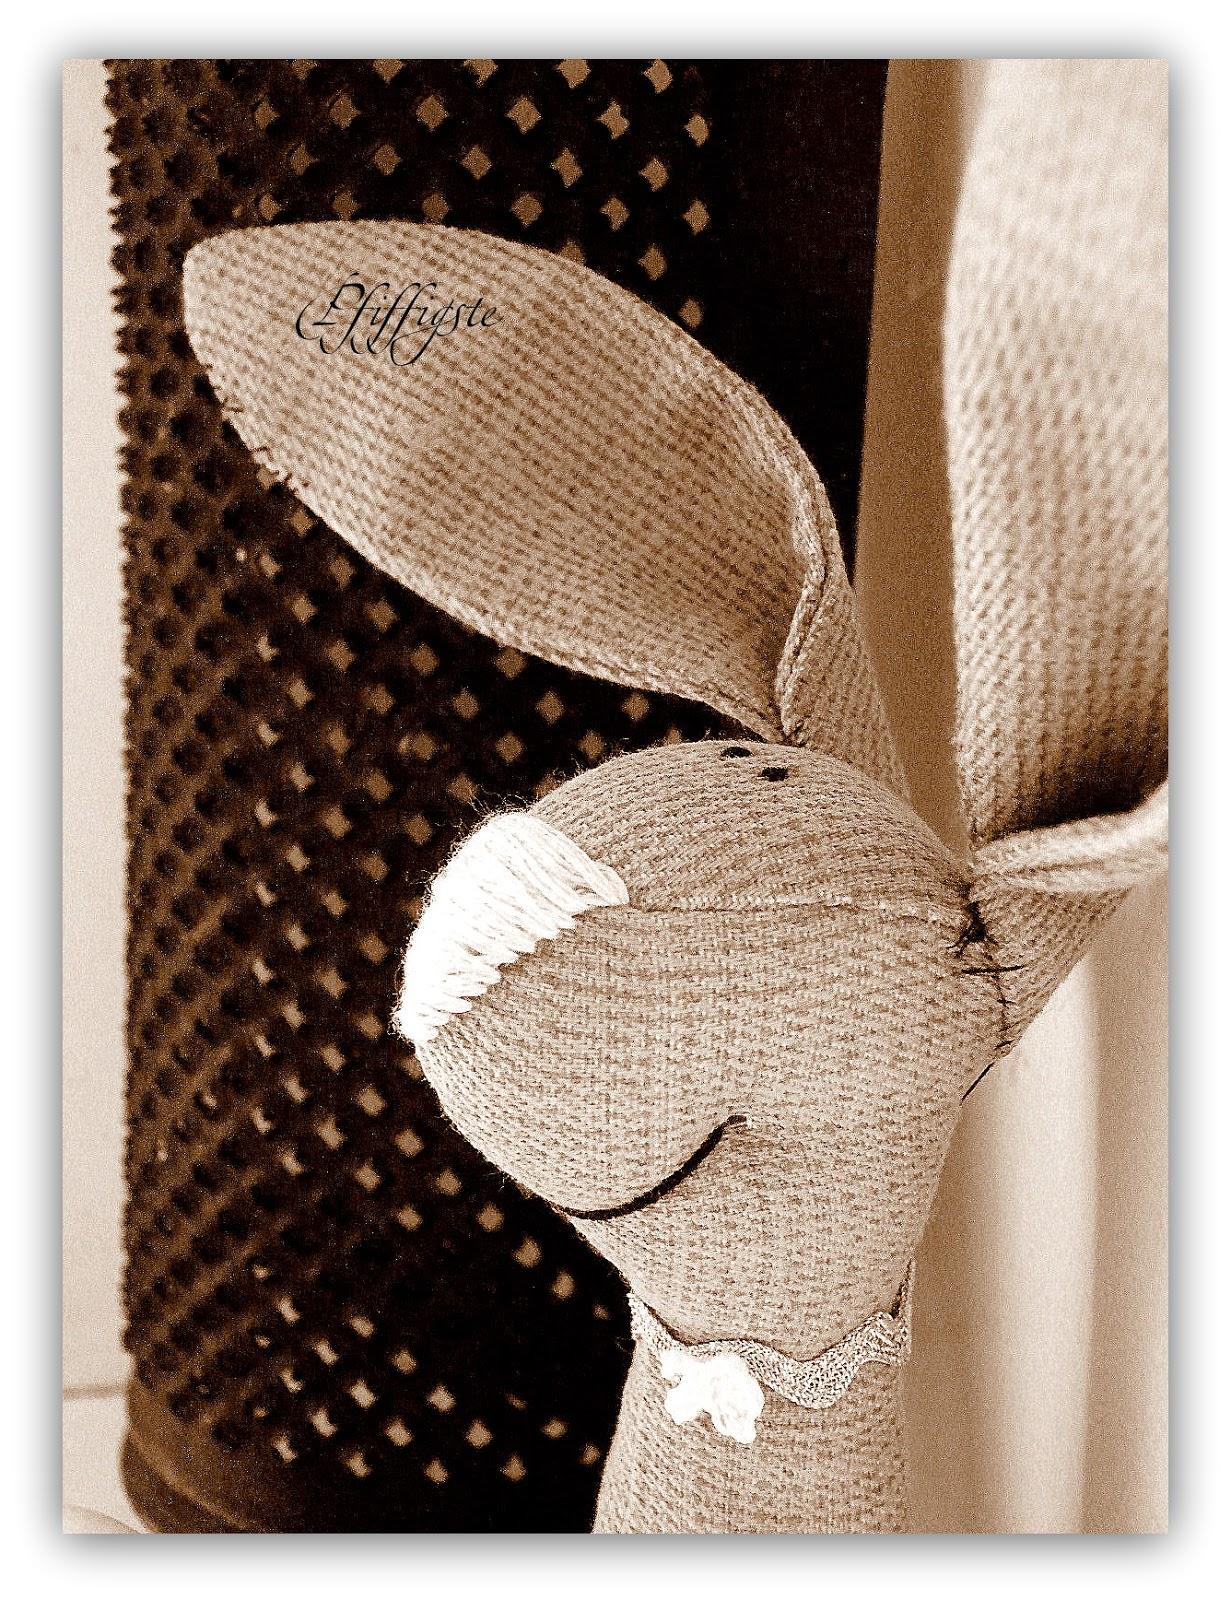 Old Fashioned Nähen Hase Muster Elaboration - Decke Stricken Muster ...